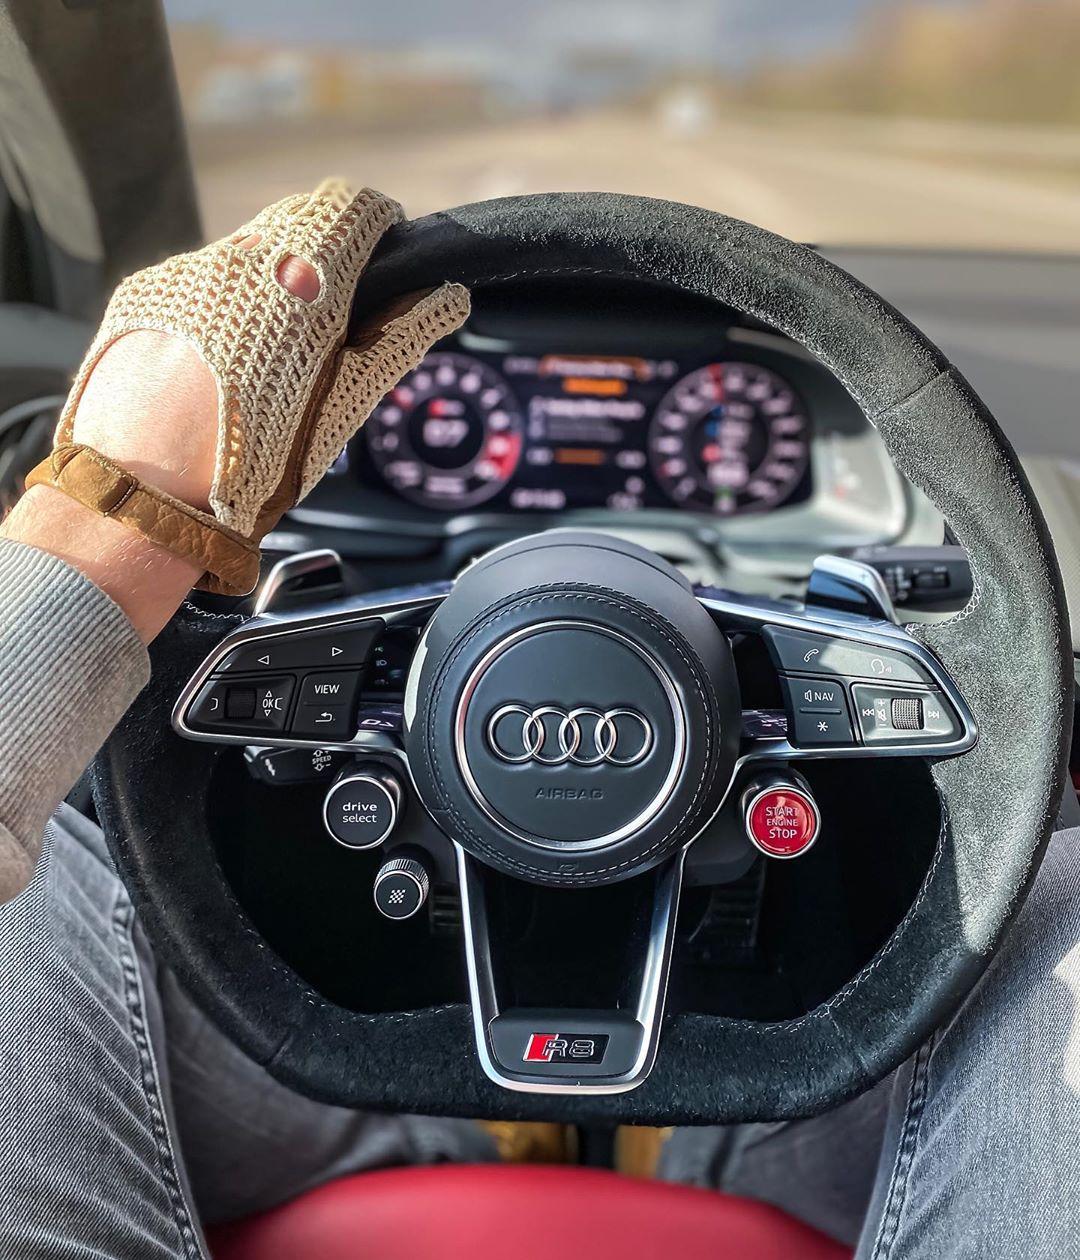 Andrà tutto bene🇮🇹🙏 #andràtuttobene #iphone11pro #iphone11 #audir8 #audisport #audir8facelift #audir8v10 #r8 #r8facelift #r8v10 #automanntv #automannsgarage